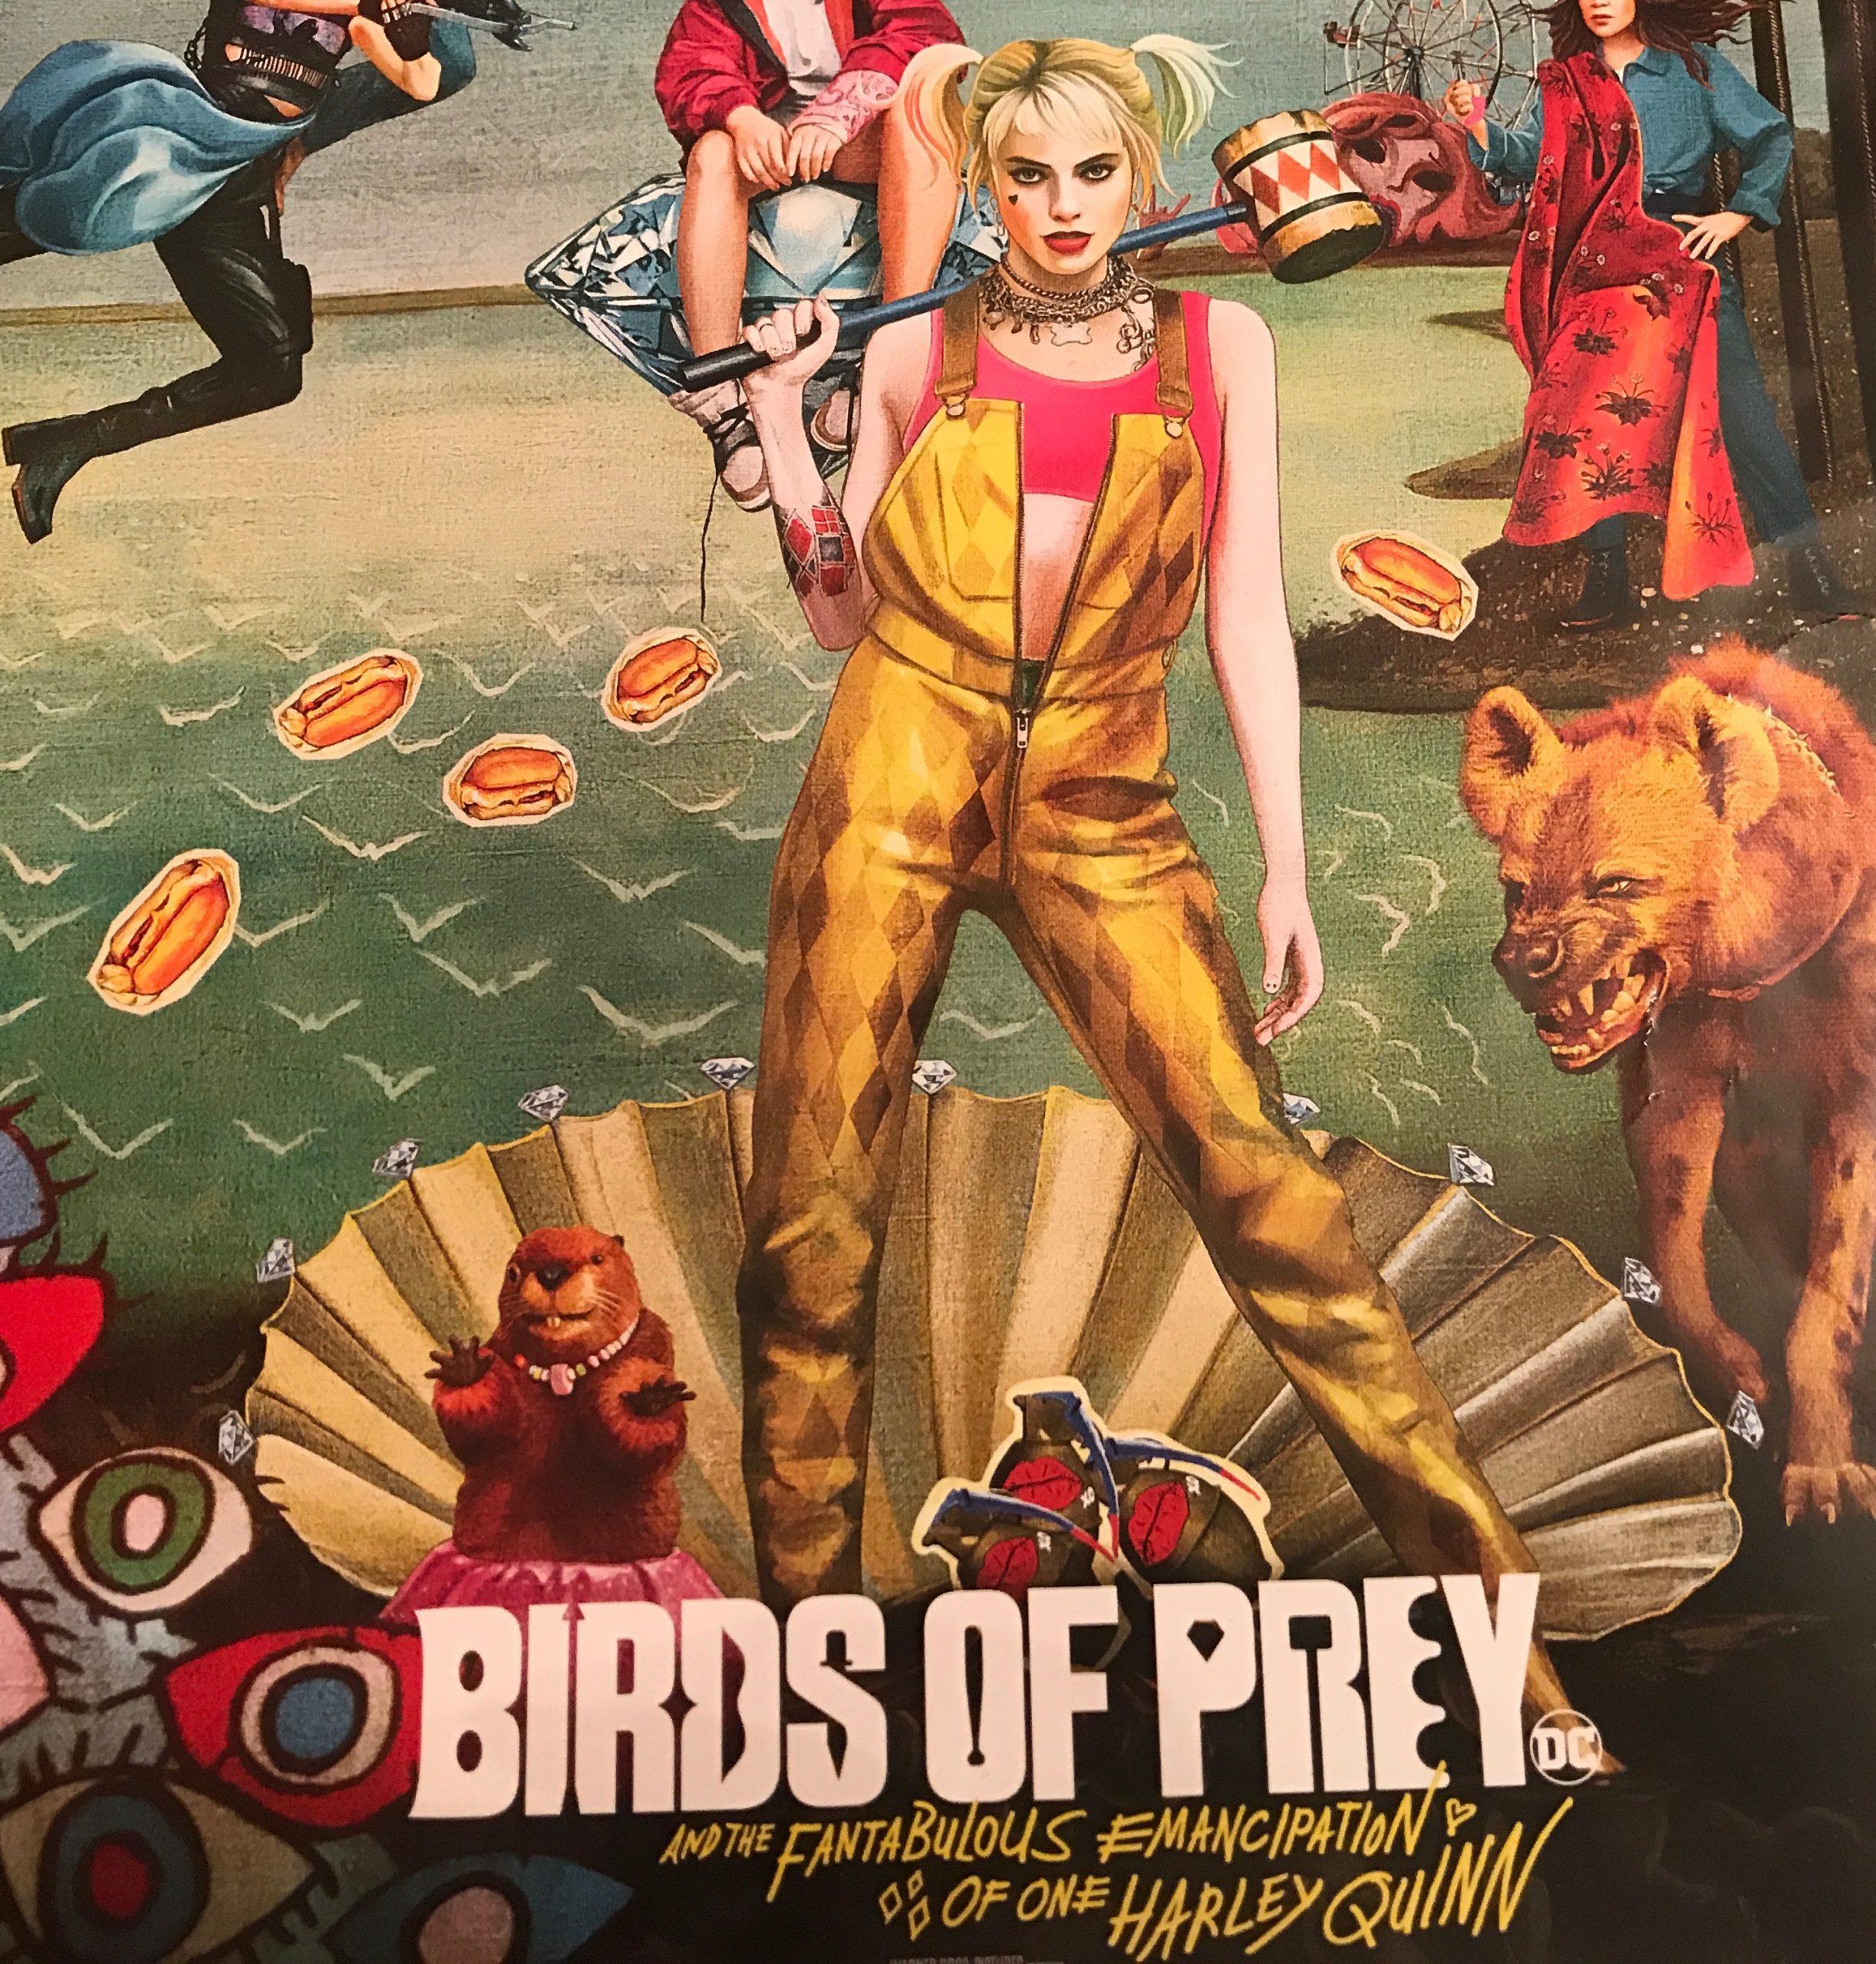 Birds of Prey | Movie Review